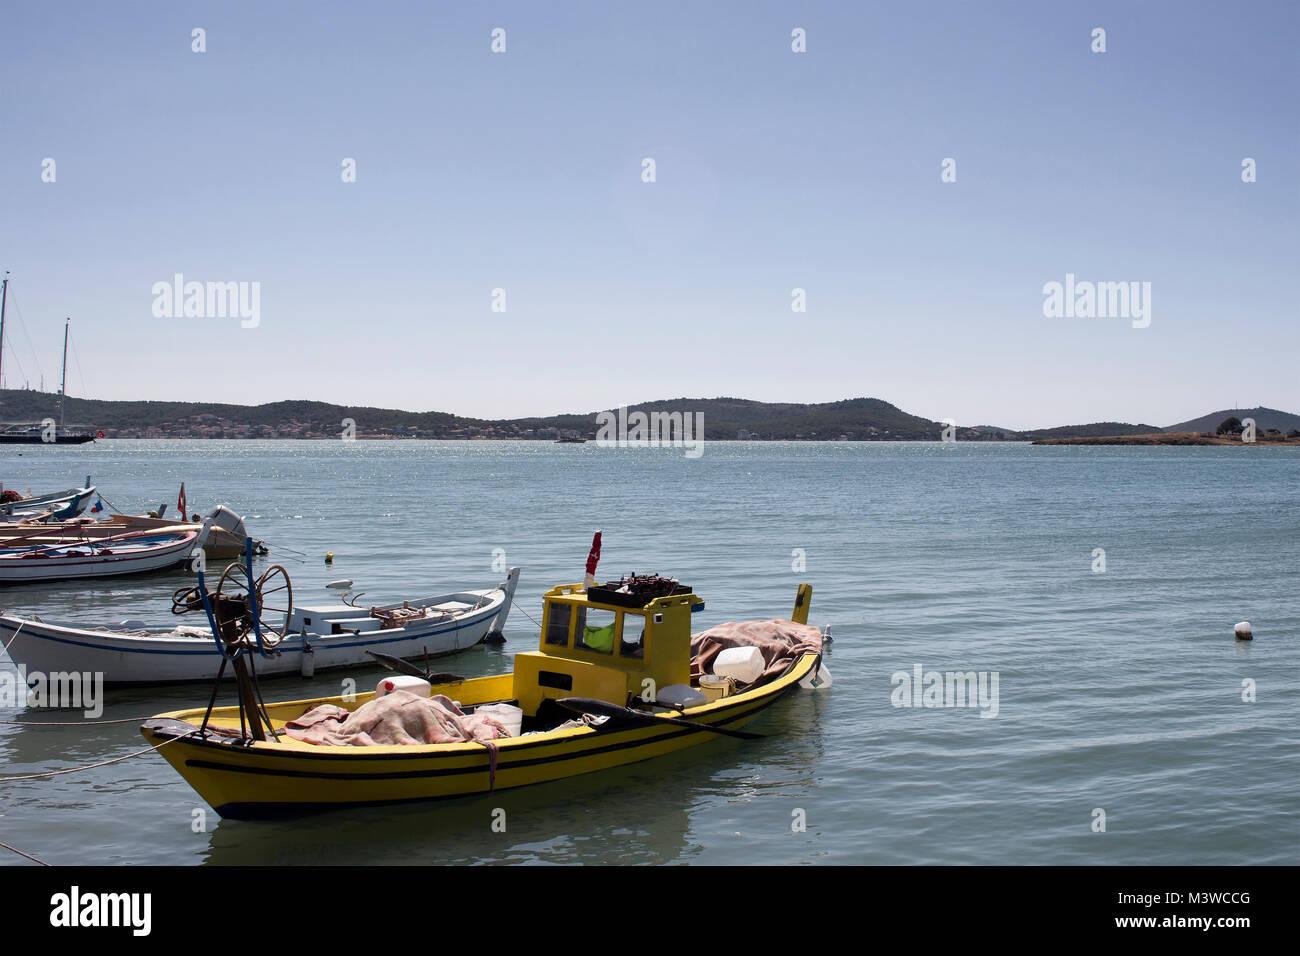 Small, wooden fishing boats and Aegean sea in Cunda (Alibey) island. - Stock Image